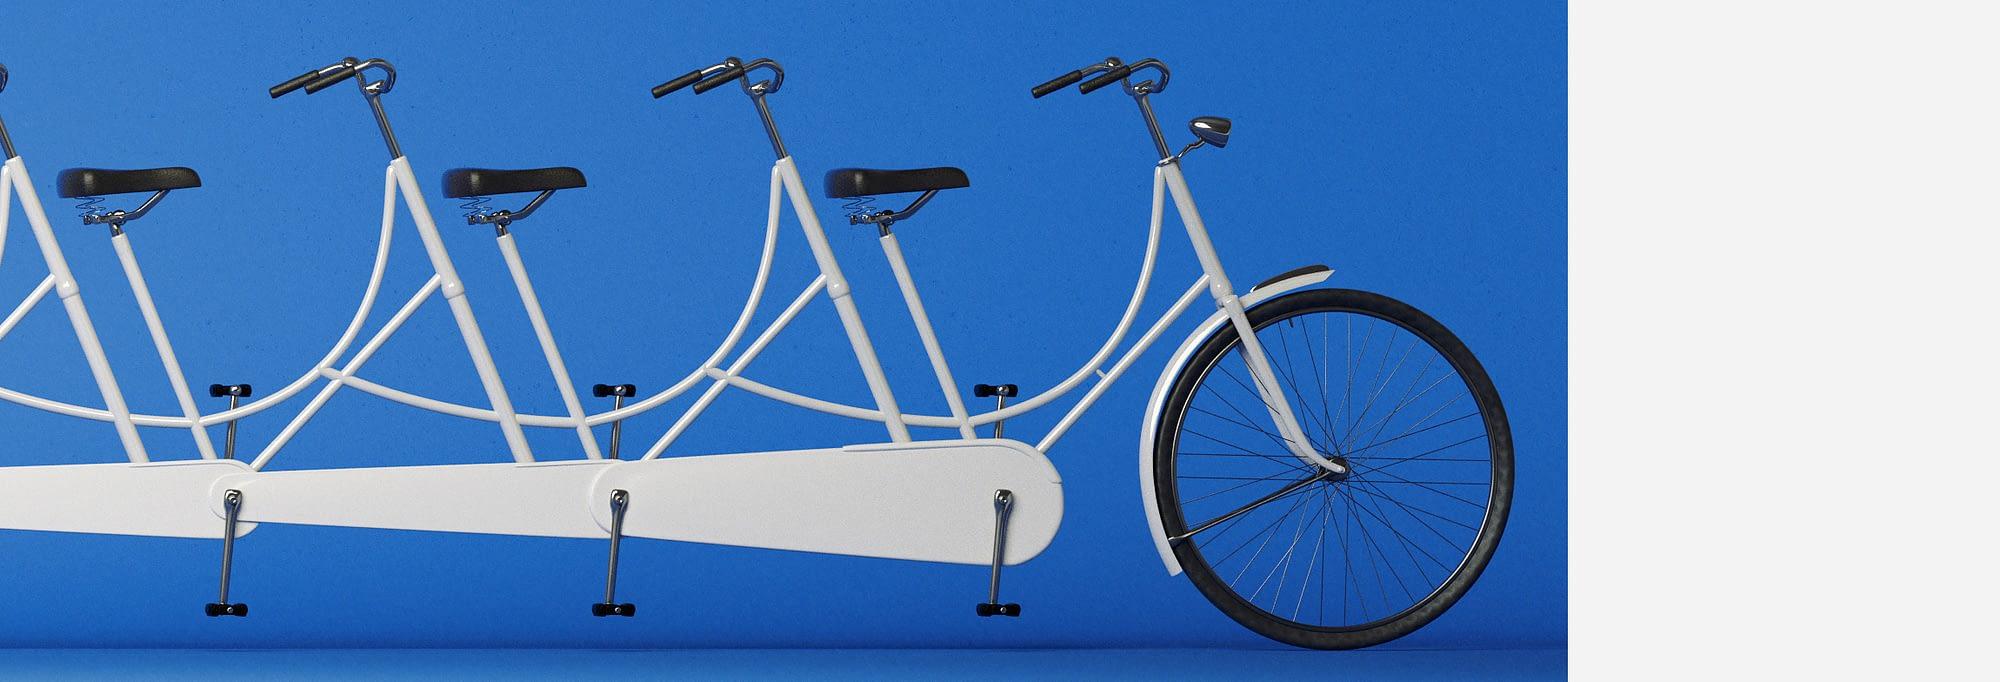 Ocean-Bike-02